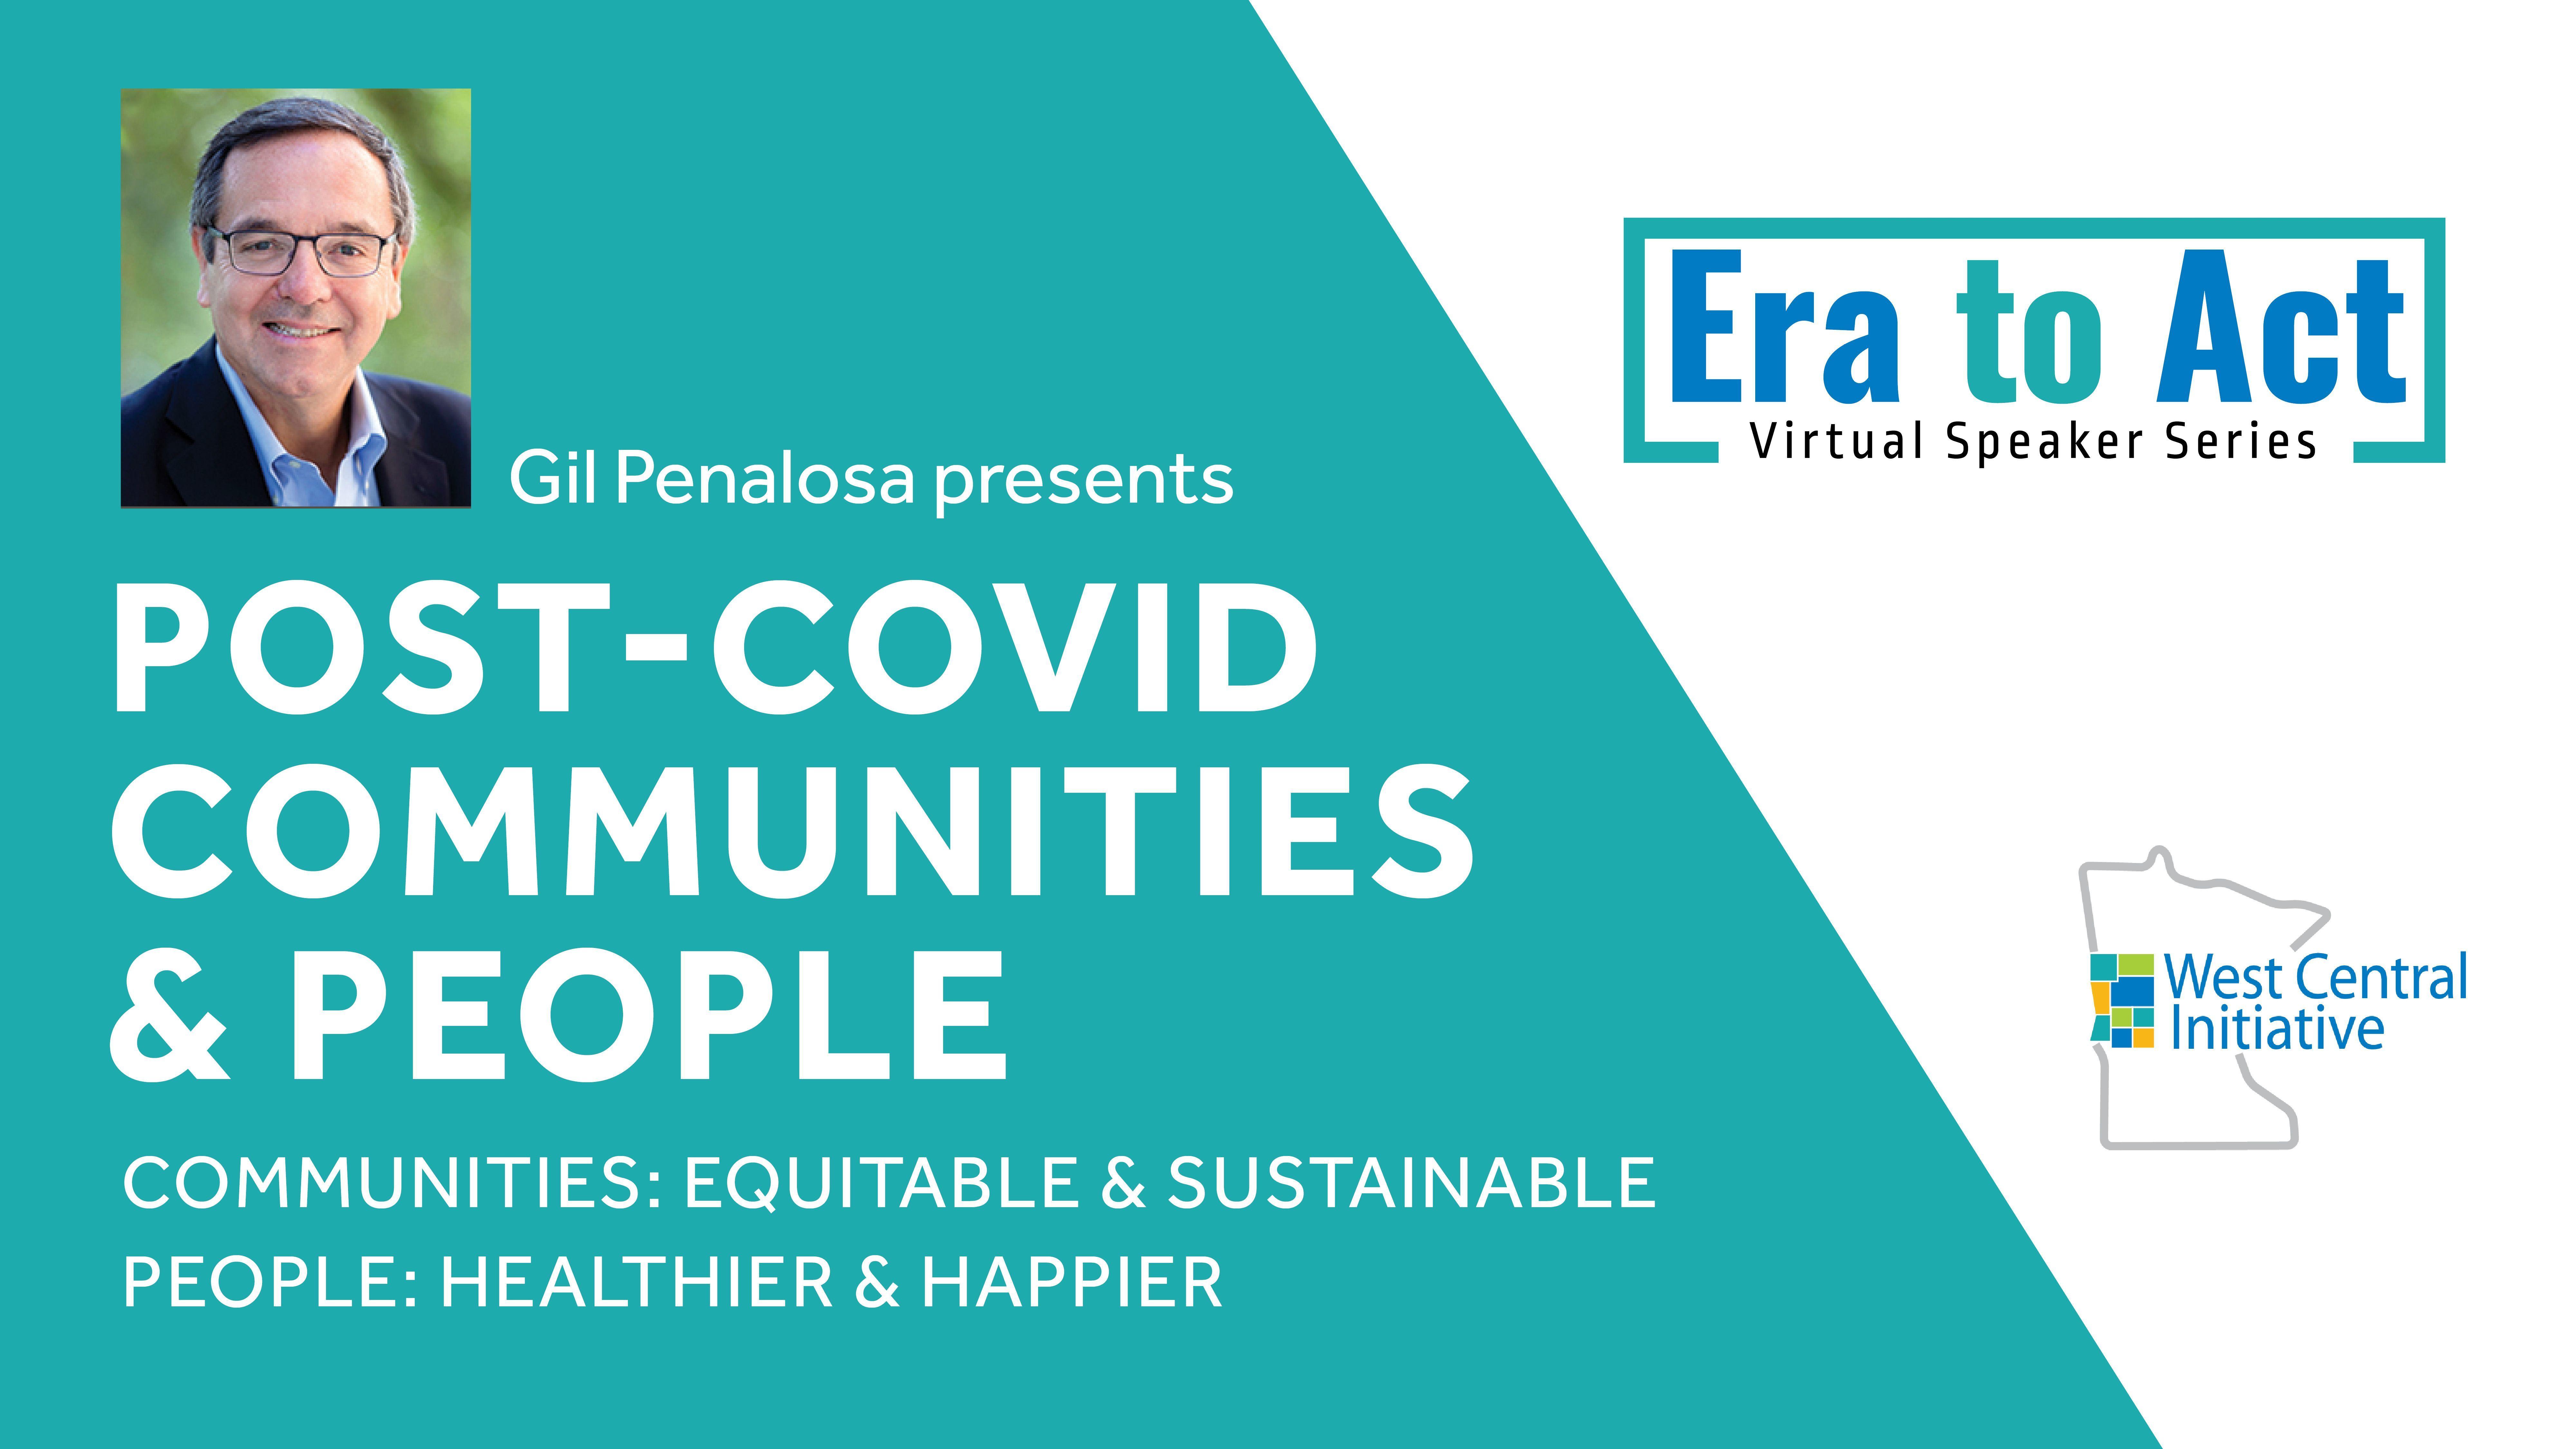 Post-COVID Communities & People